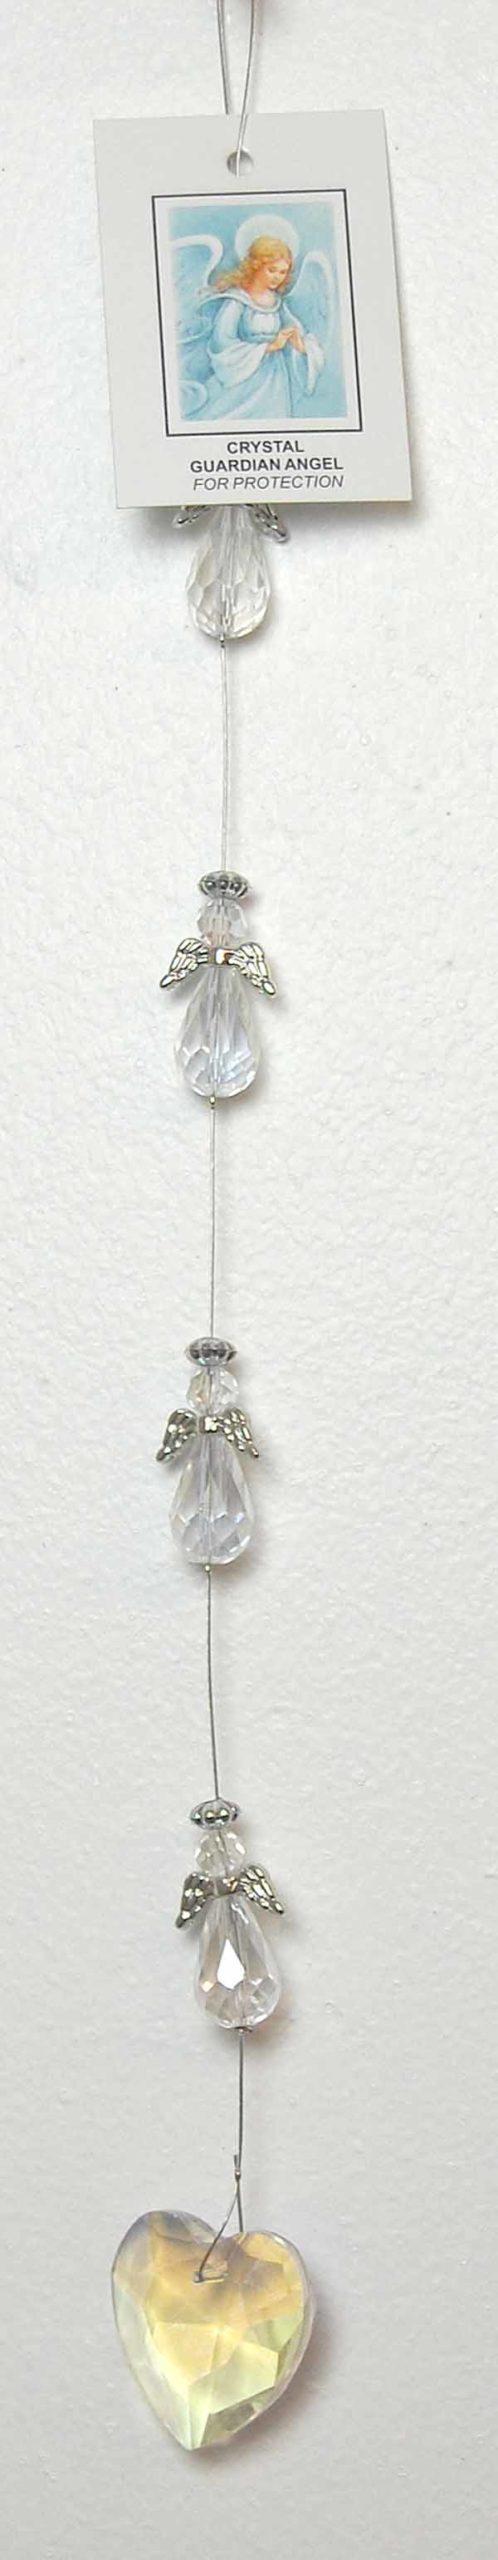 Quartz Angels with Quartz Heart Decoration Gift